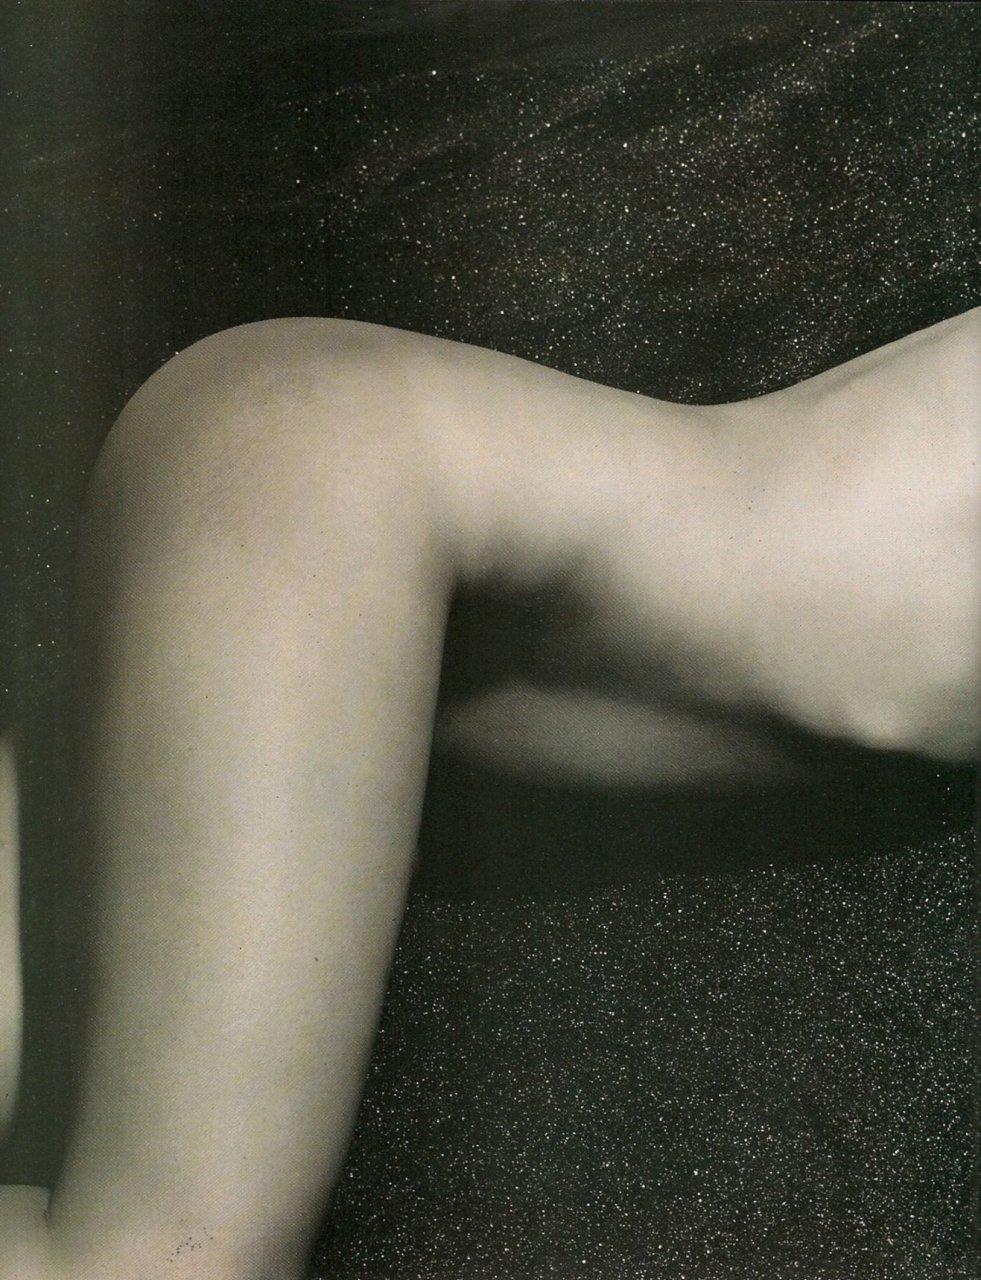 Double dildo man woman